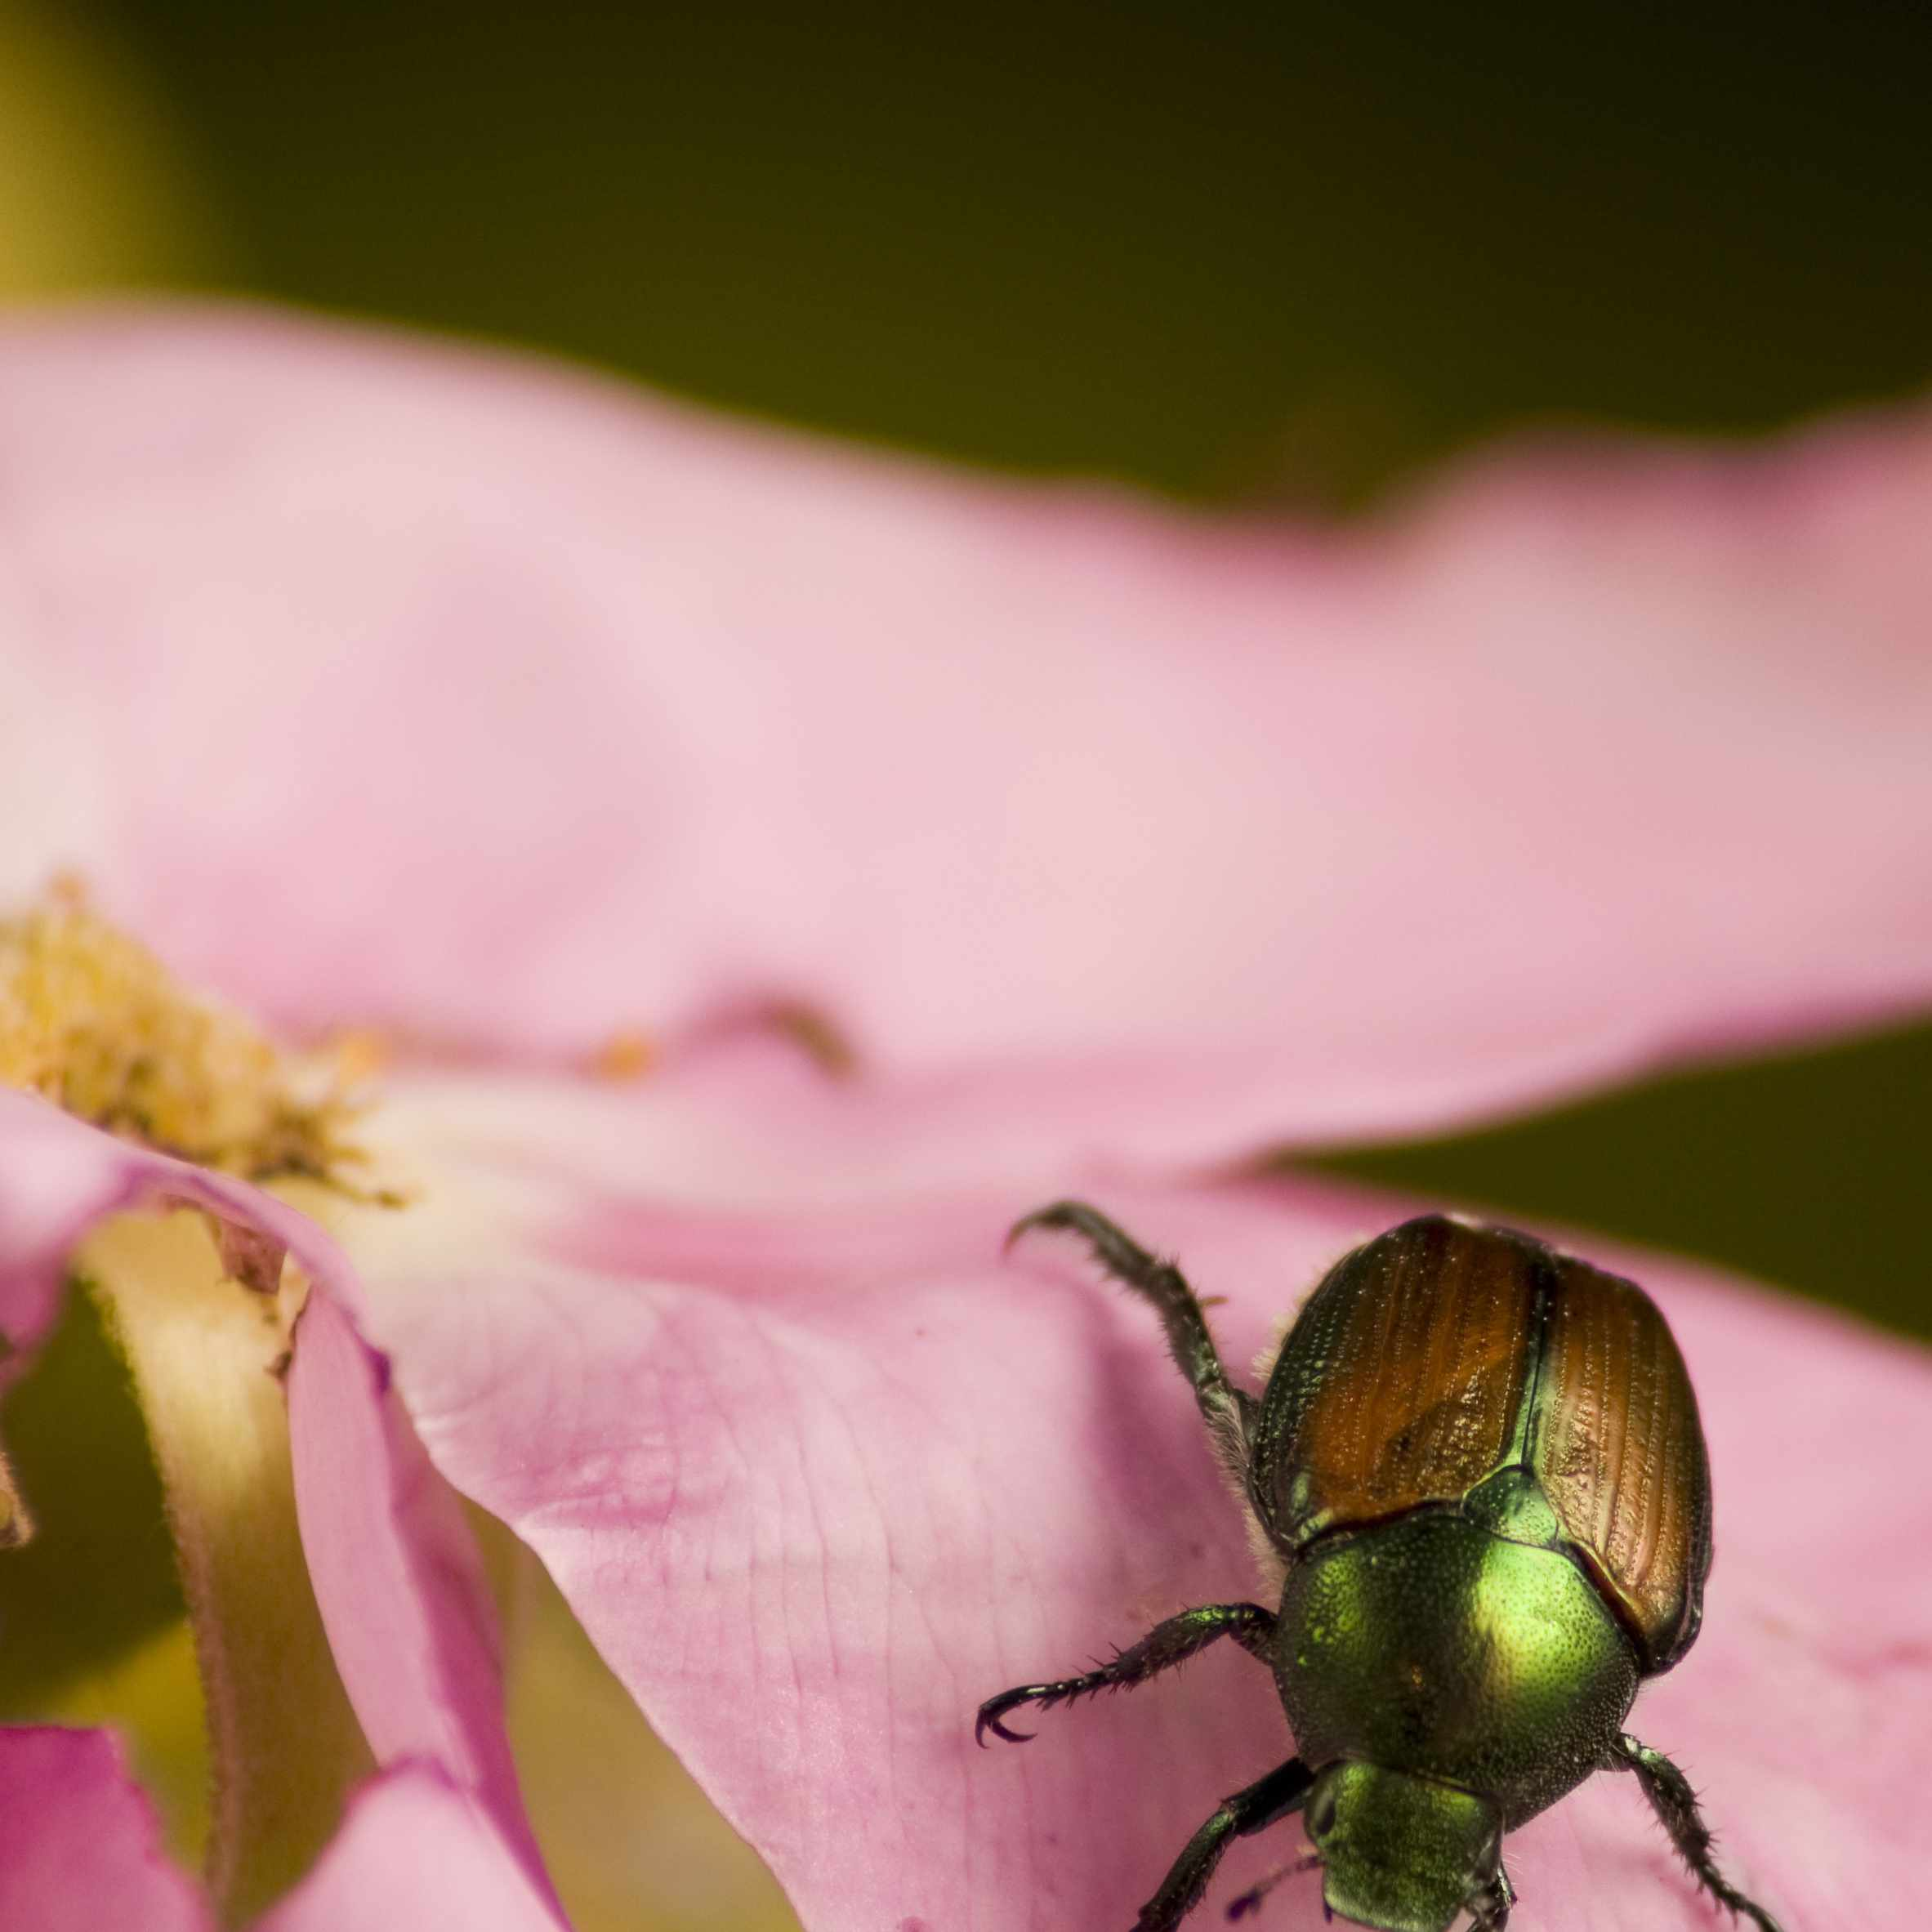 Japanese Beetle eating a rose